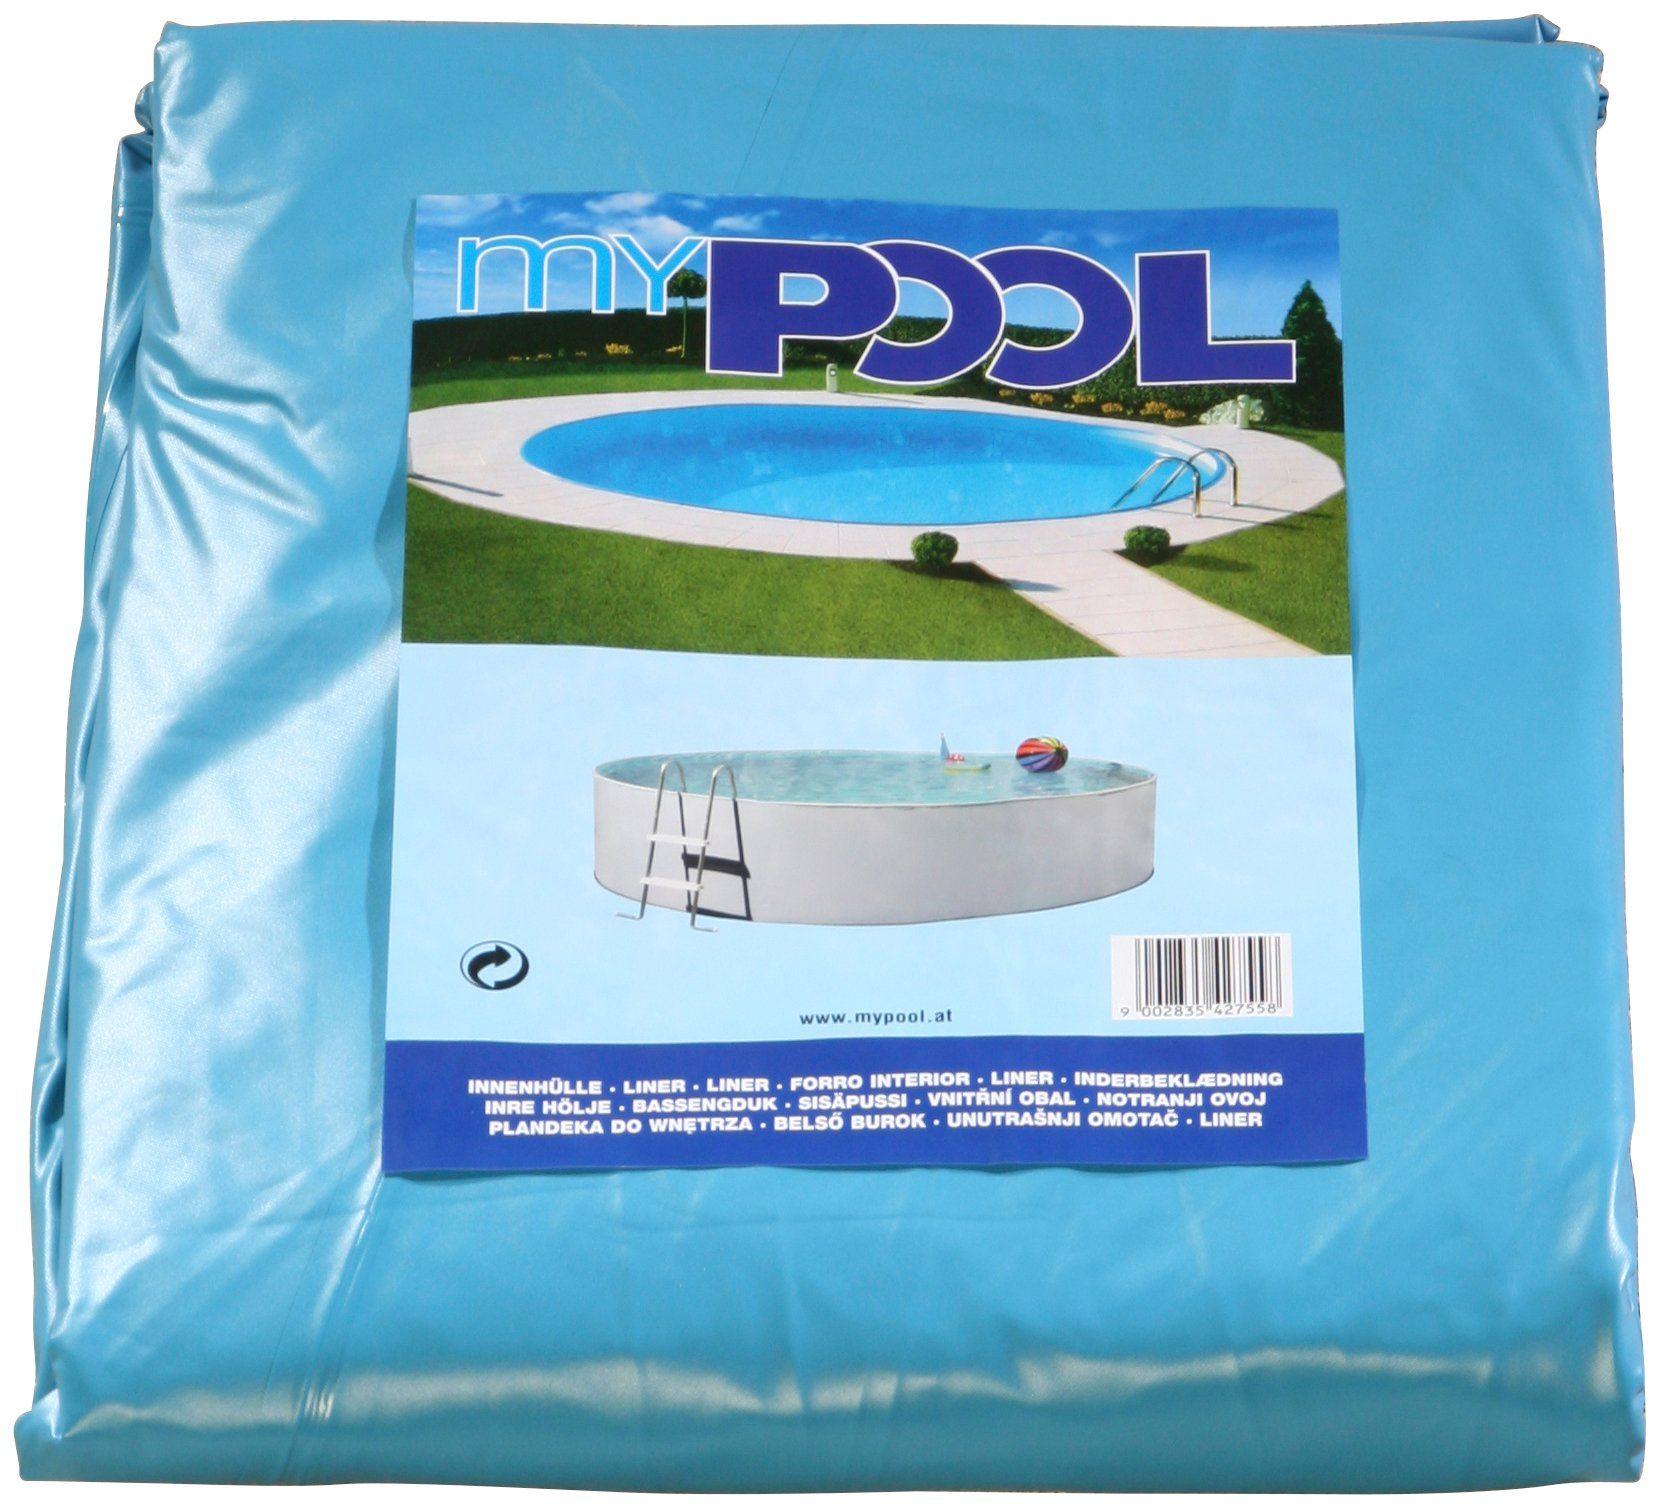 MYPOOL Pool-Innenhülle , für ØxH: 350x90 cm, 0,25 mm, sand